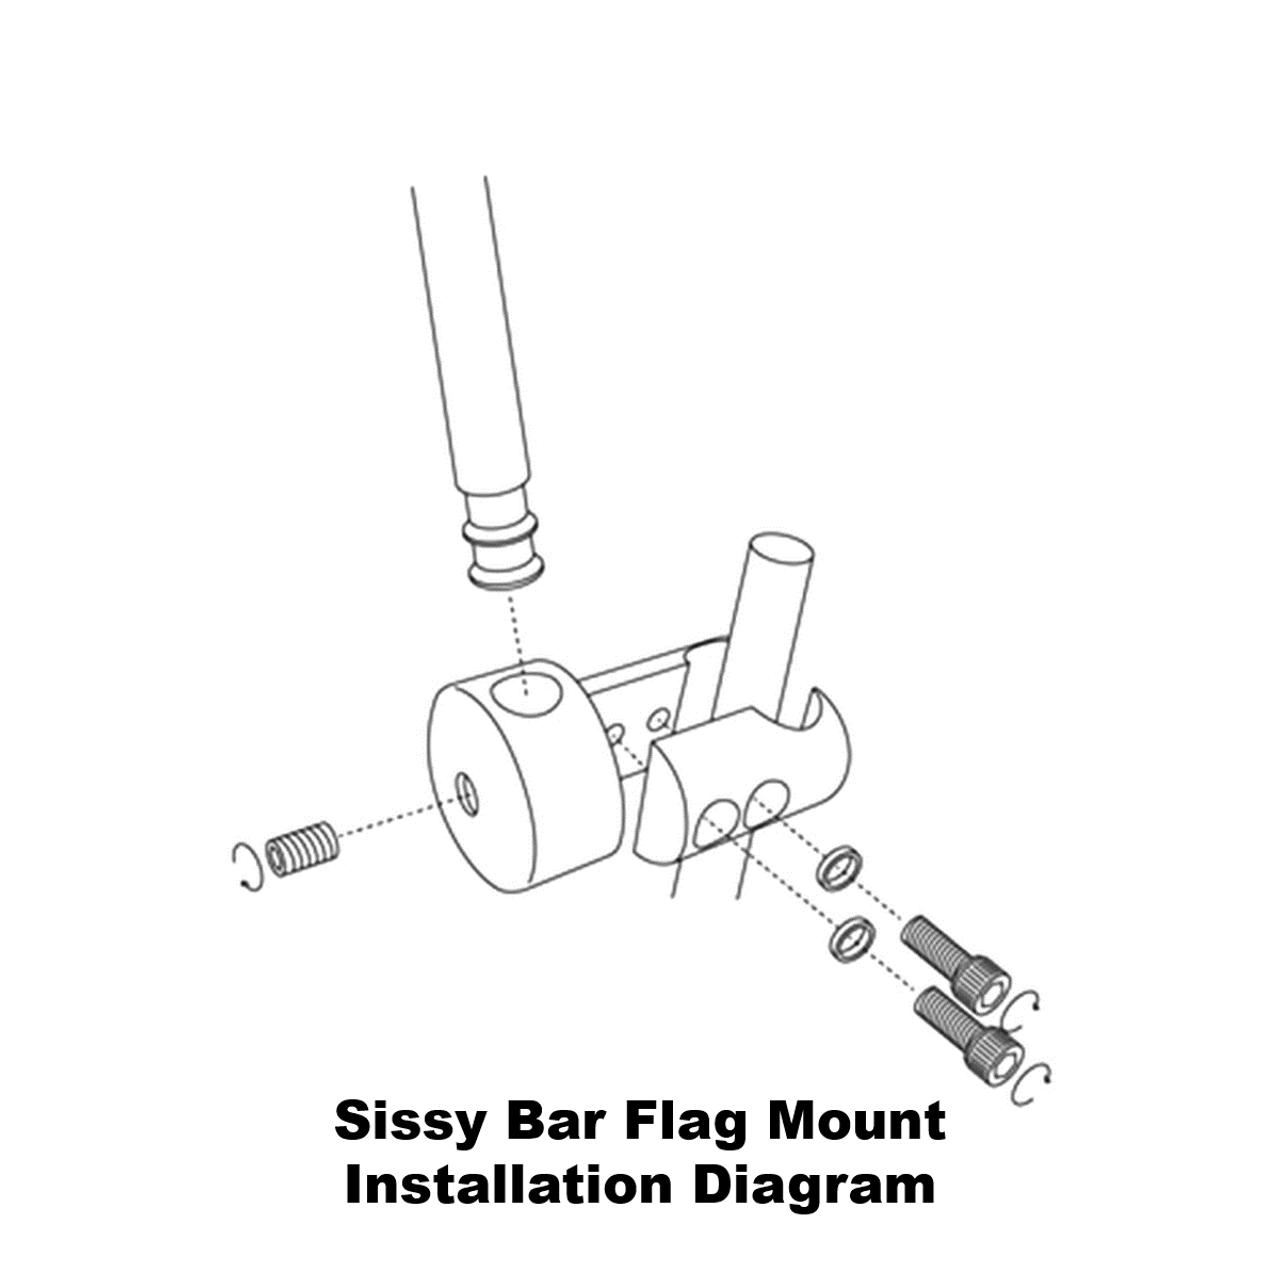 RDSB Sissy Bar Flag Mount Installation Diagram (exploded view)